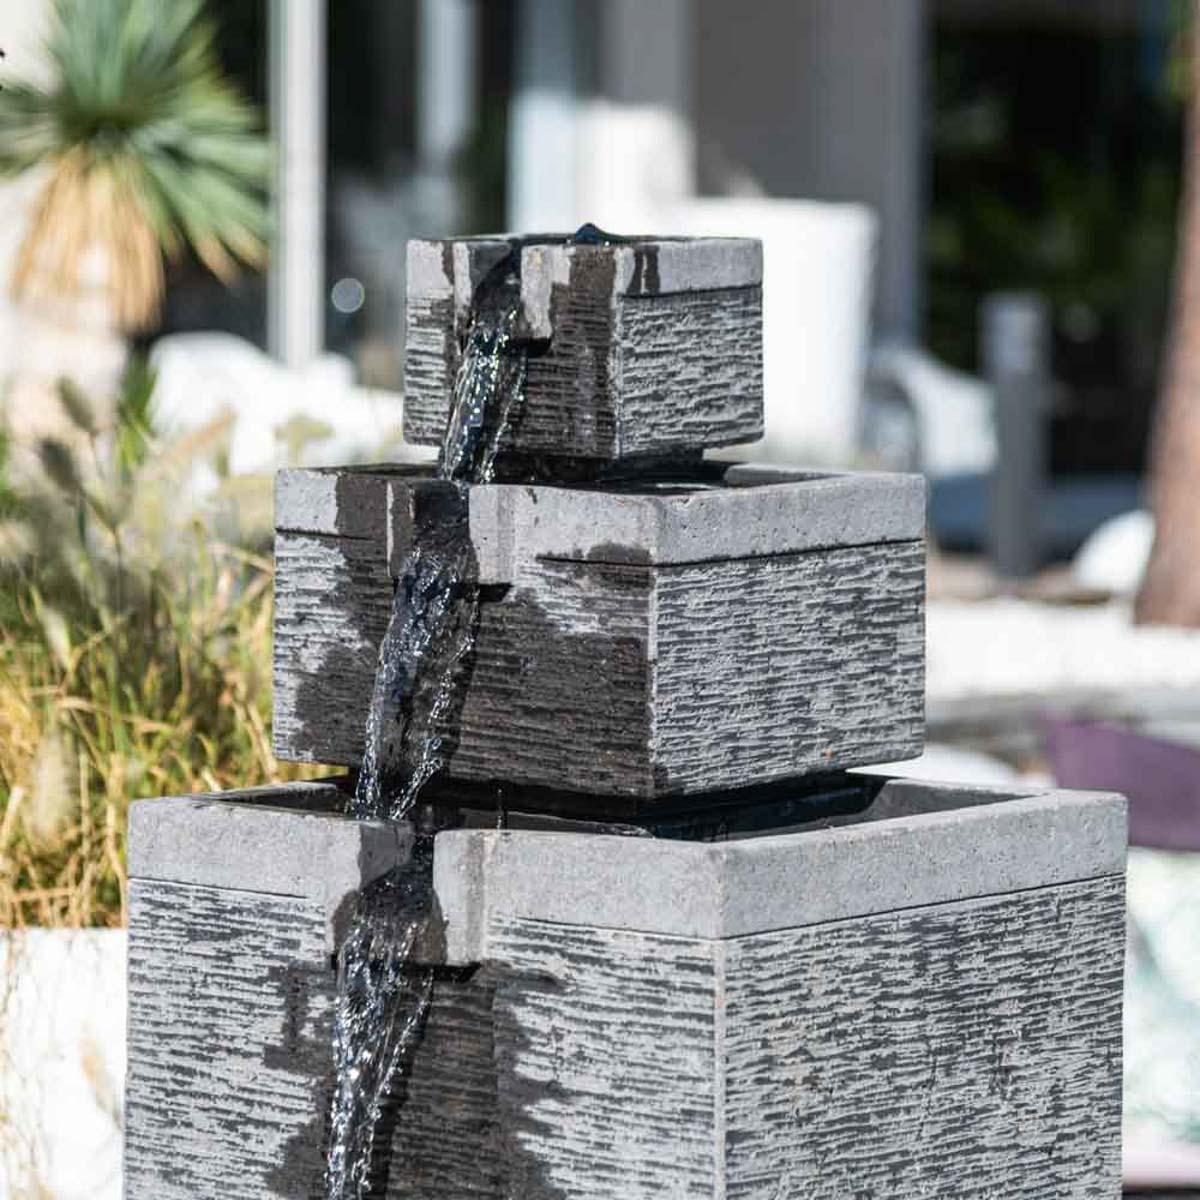 fontaine de jardin bassin carr 4 coupes noir gris. Black Bedroom Furniture Sets. Home Design Ideas